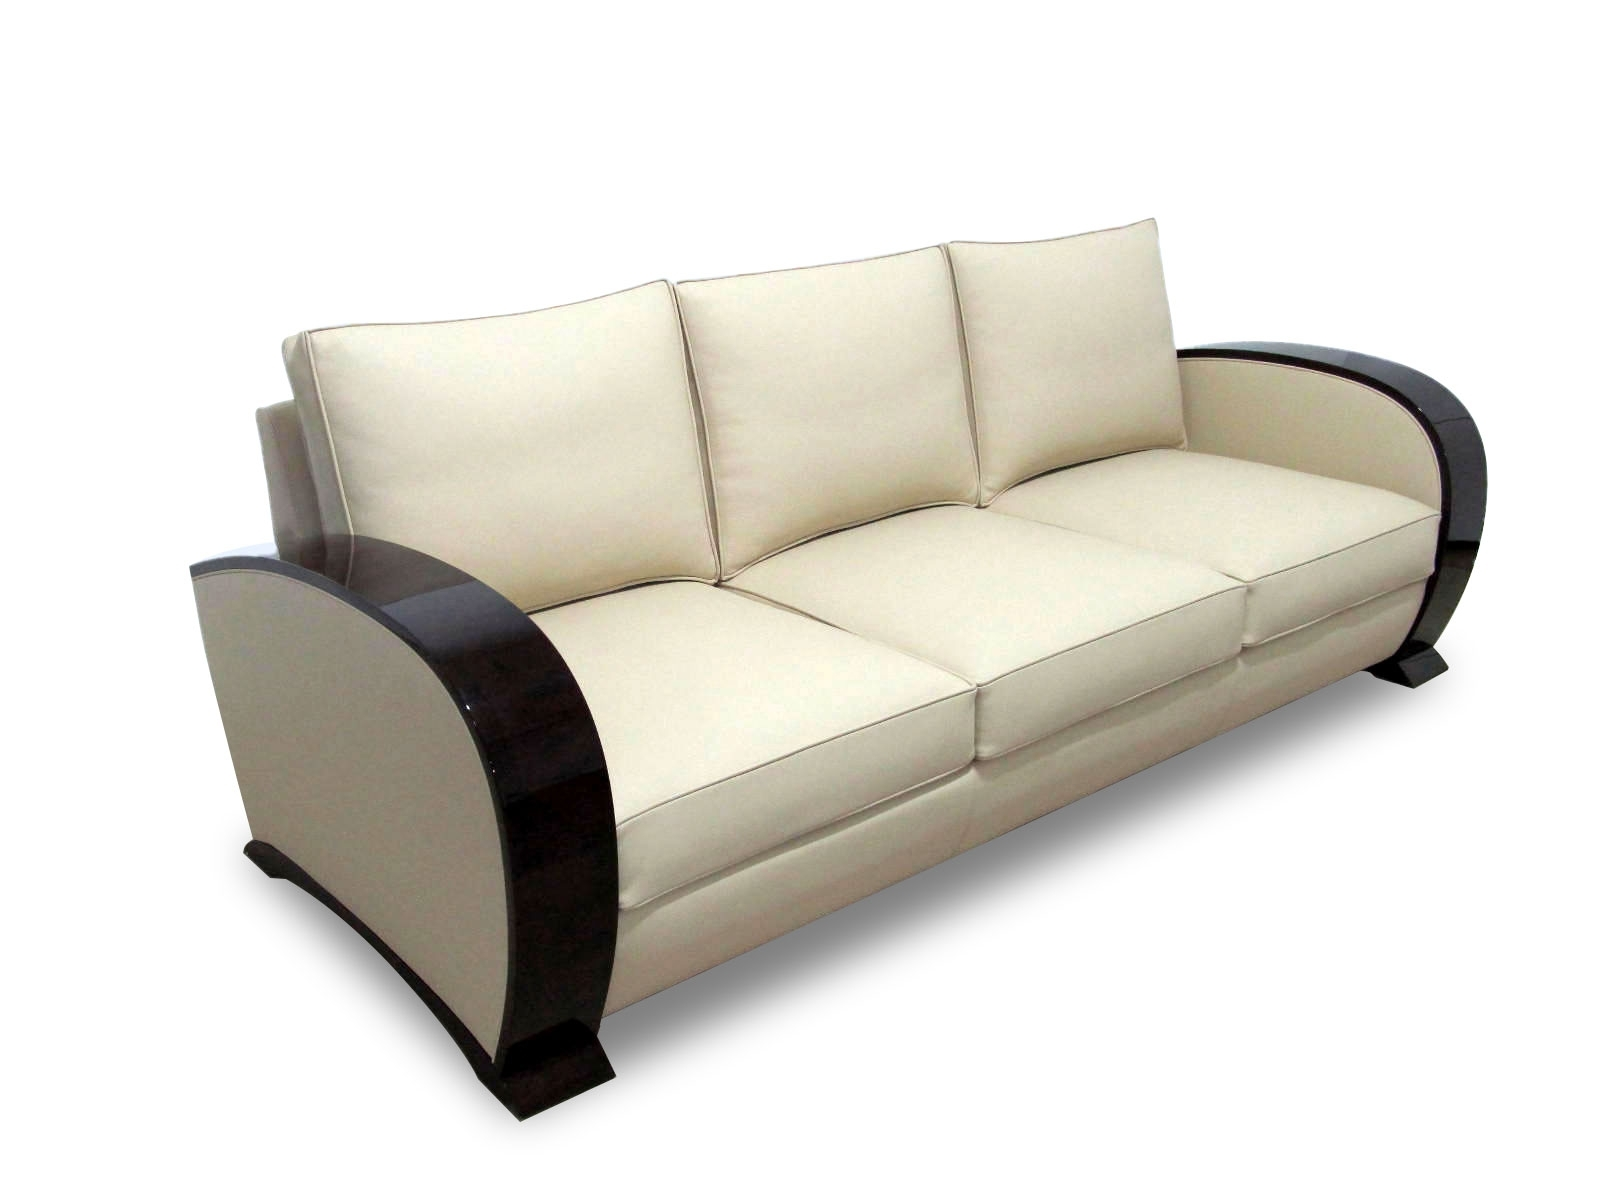 Art Deco Furniture – Hifigeny Custom Furniture Throughout Fashionable Art Deco Sofas (View 4 of 15)